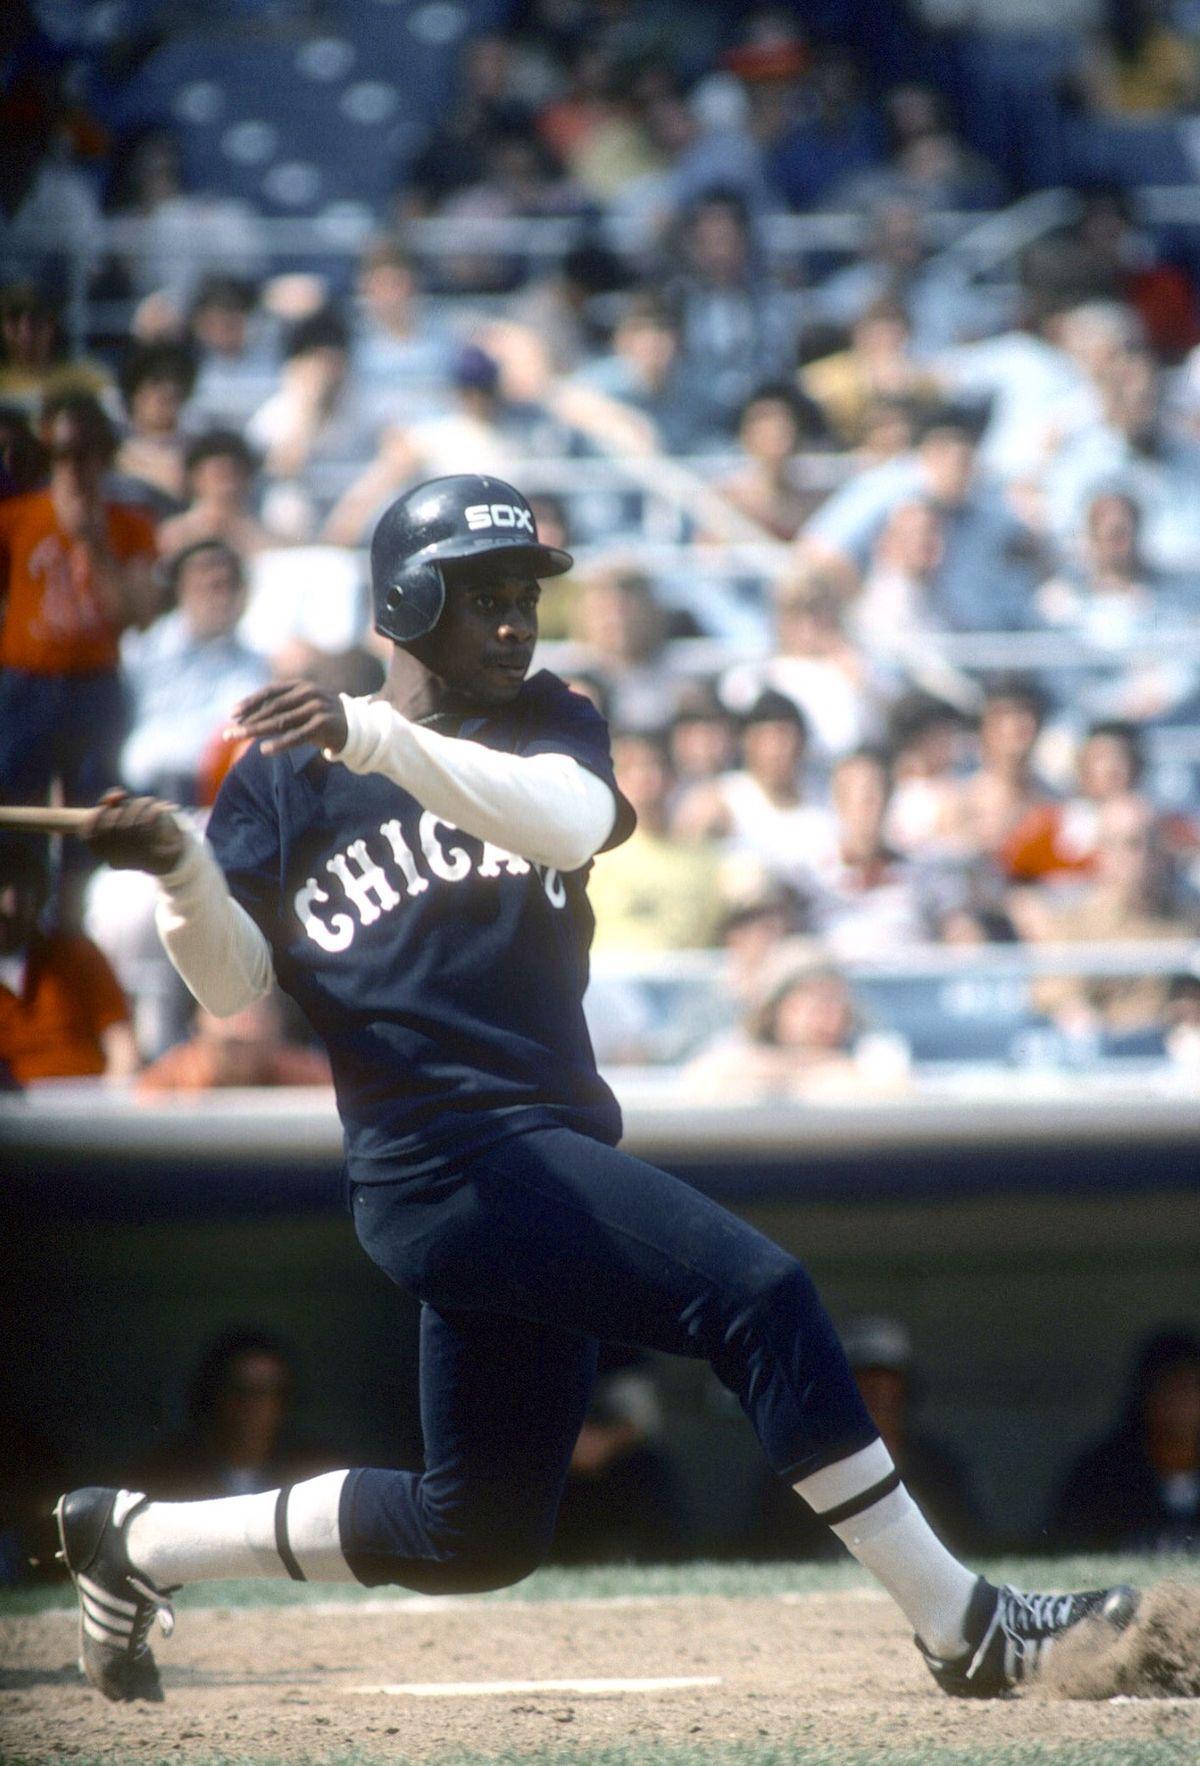 88ccc74a428 Ralph Garr - Love those 1970s Chicago White Sox uniforms